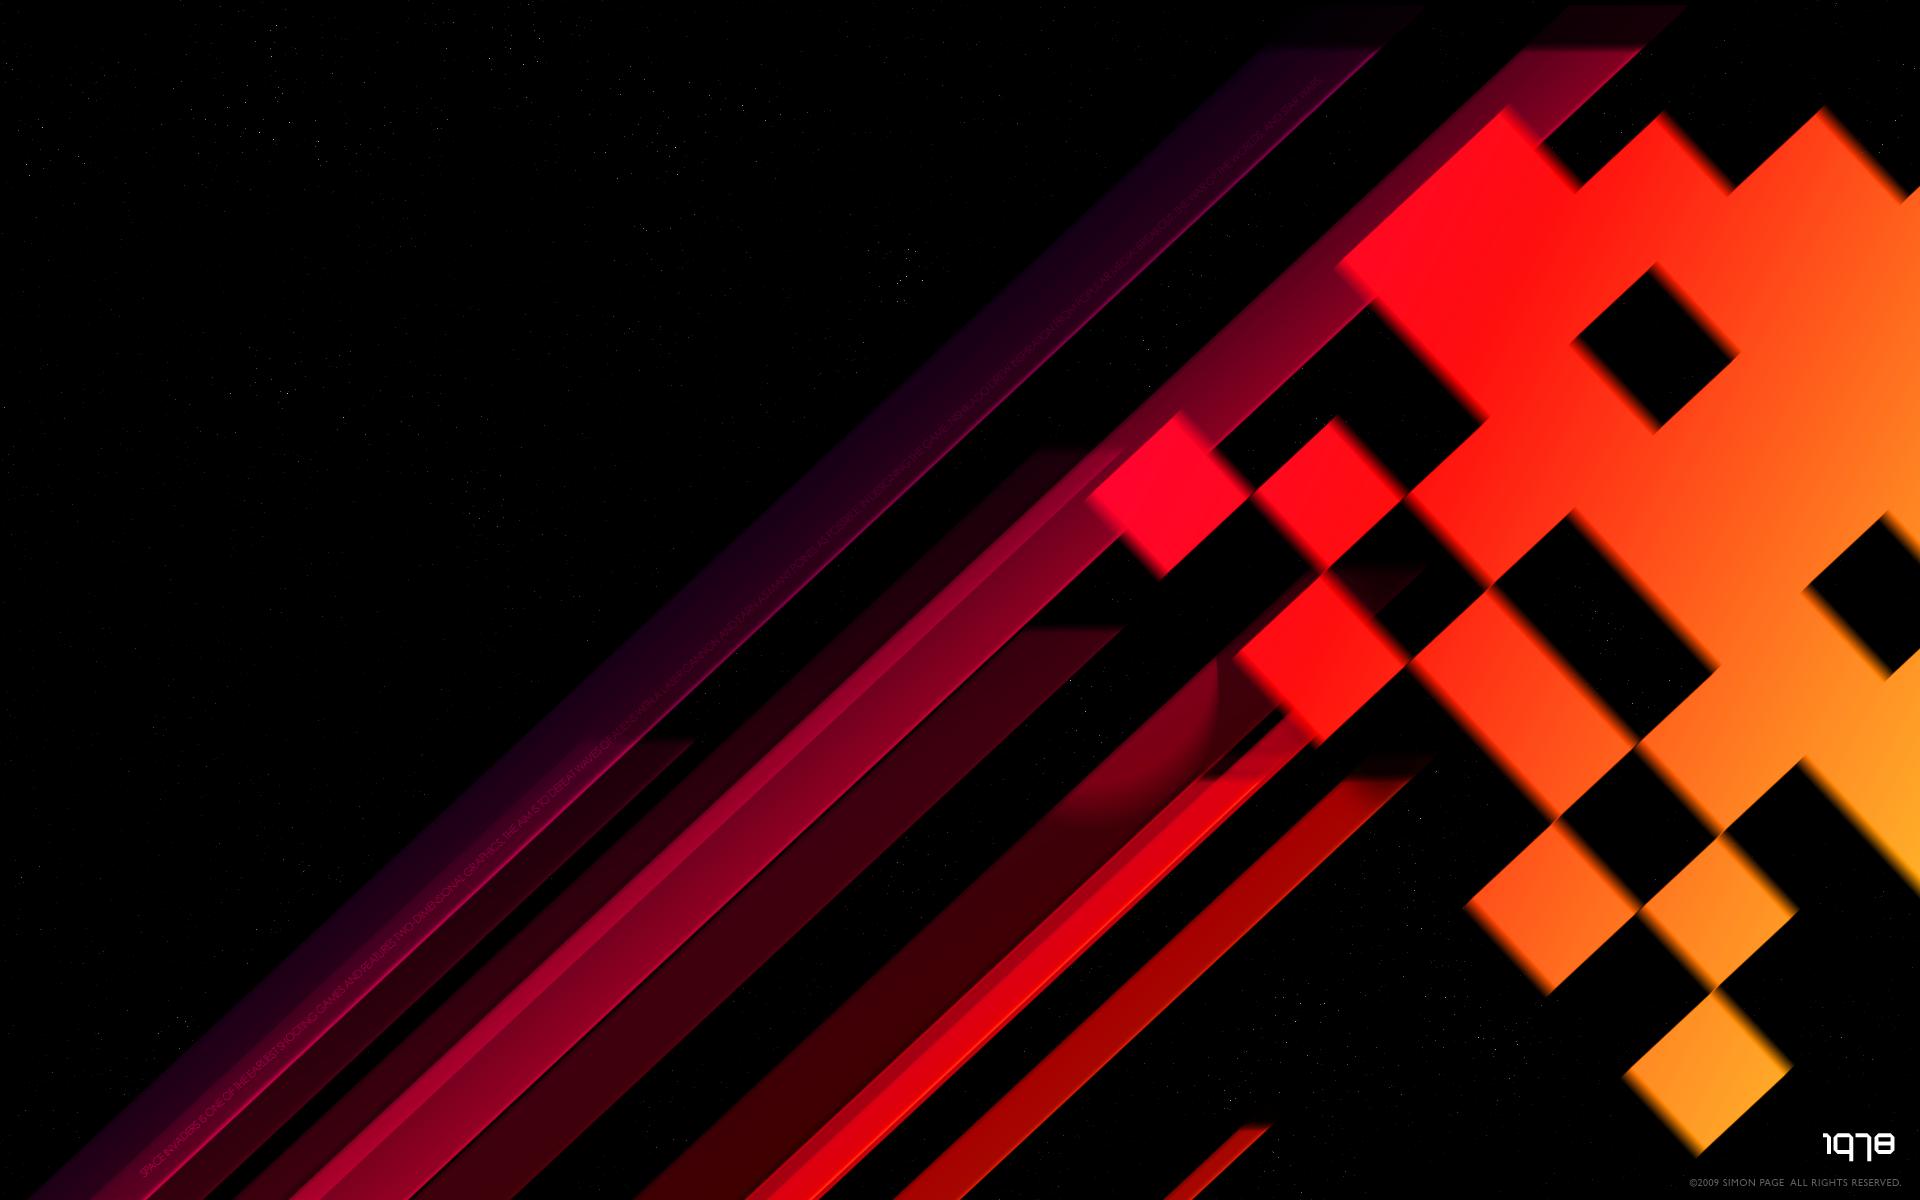 Retro Video Game Wallpapers Desktop Background Is Cool Desktop Background Gaming 1920x1200 Wallpaper Teahub Io